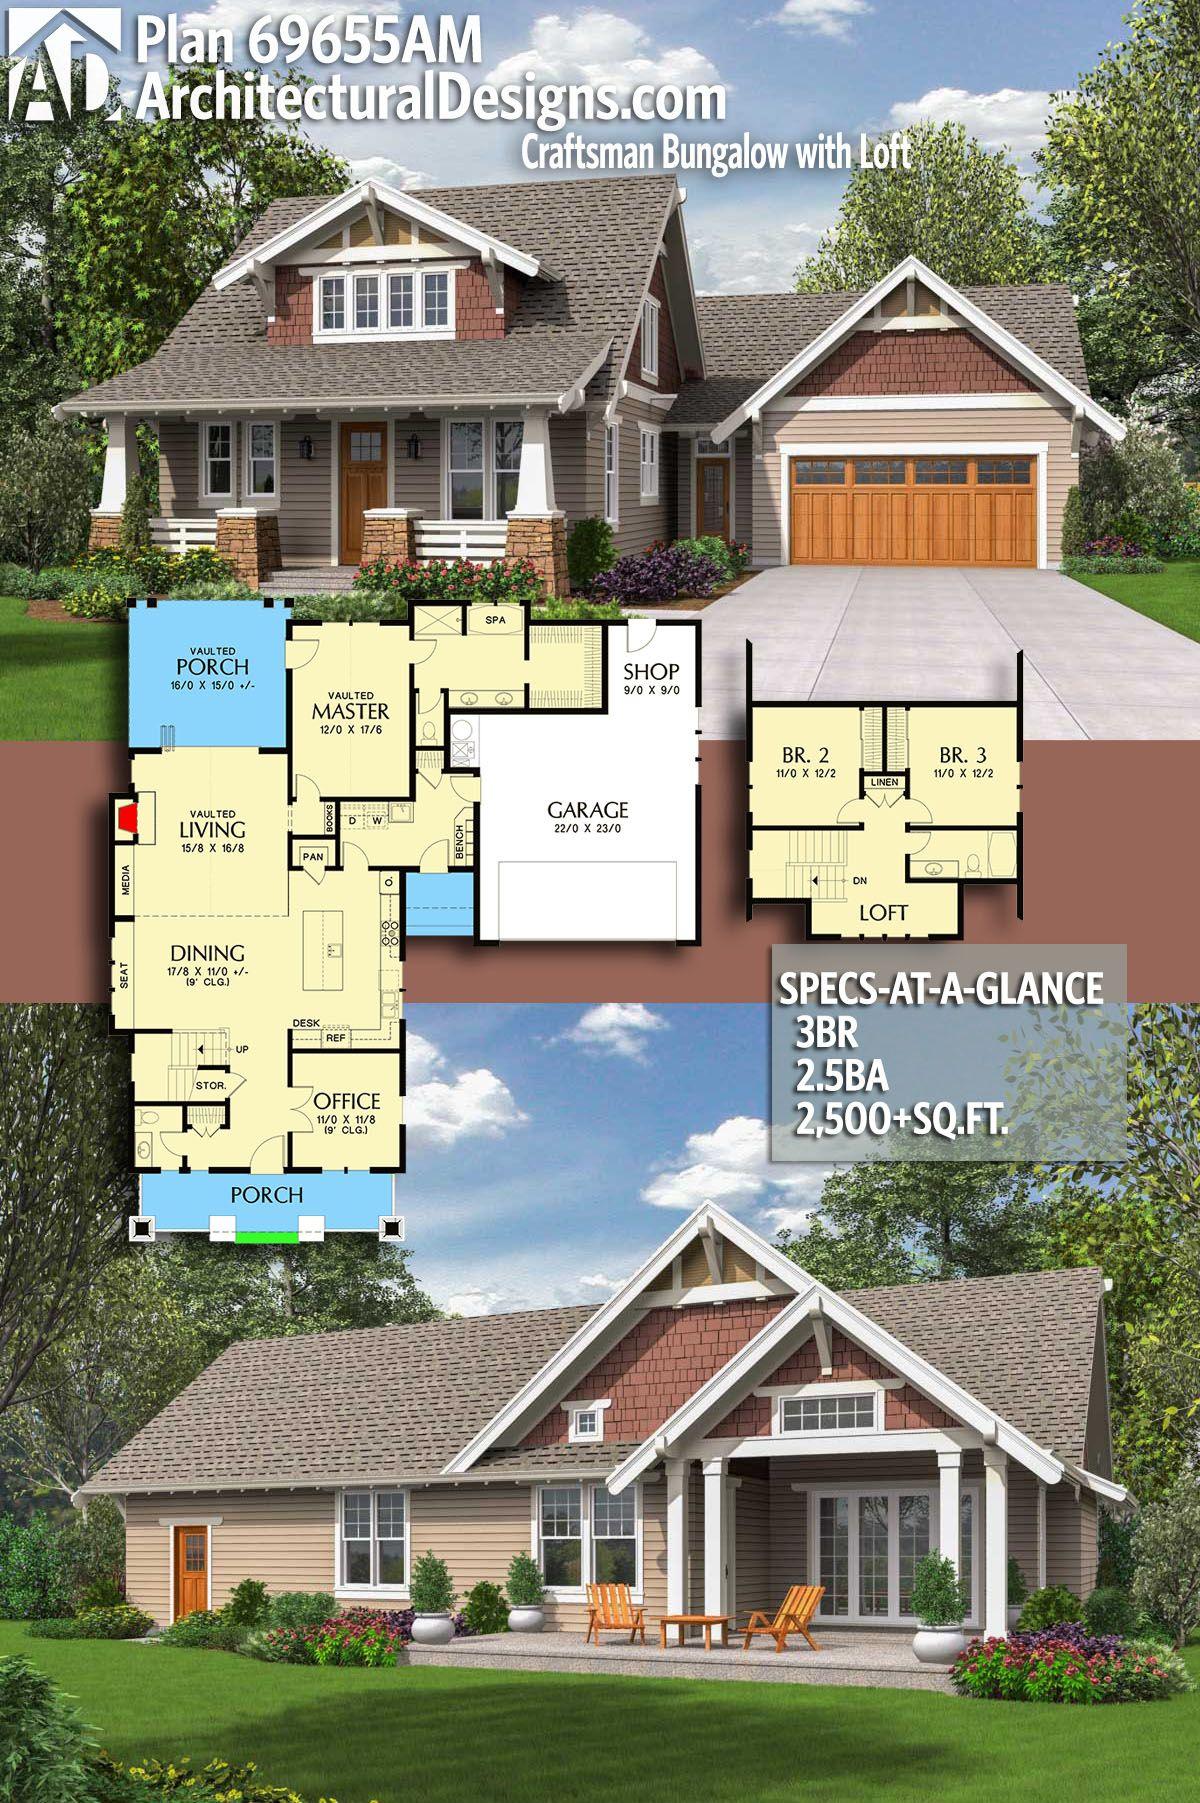 Plan 69655am Craftsman Bungalow With Loft Craftsman House Plans Craftsman House Dream House Plans